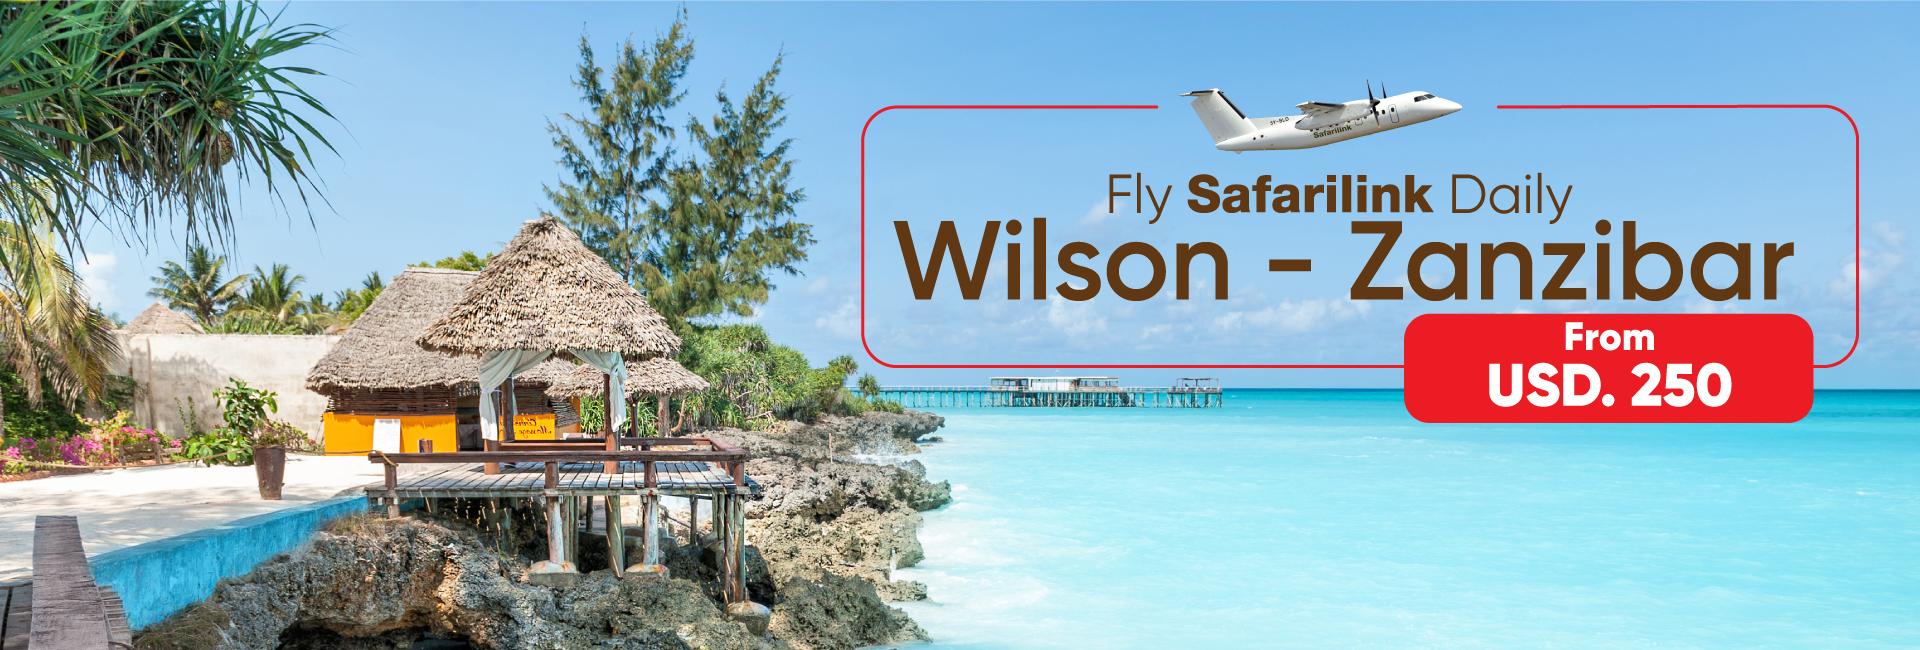 fly safarilink daily from nairobi to Zanzibar Island